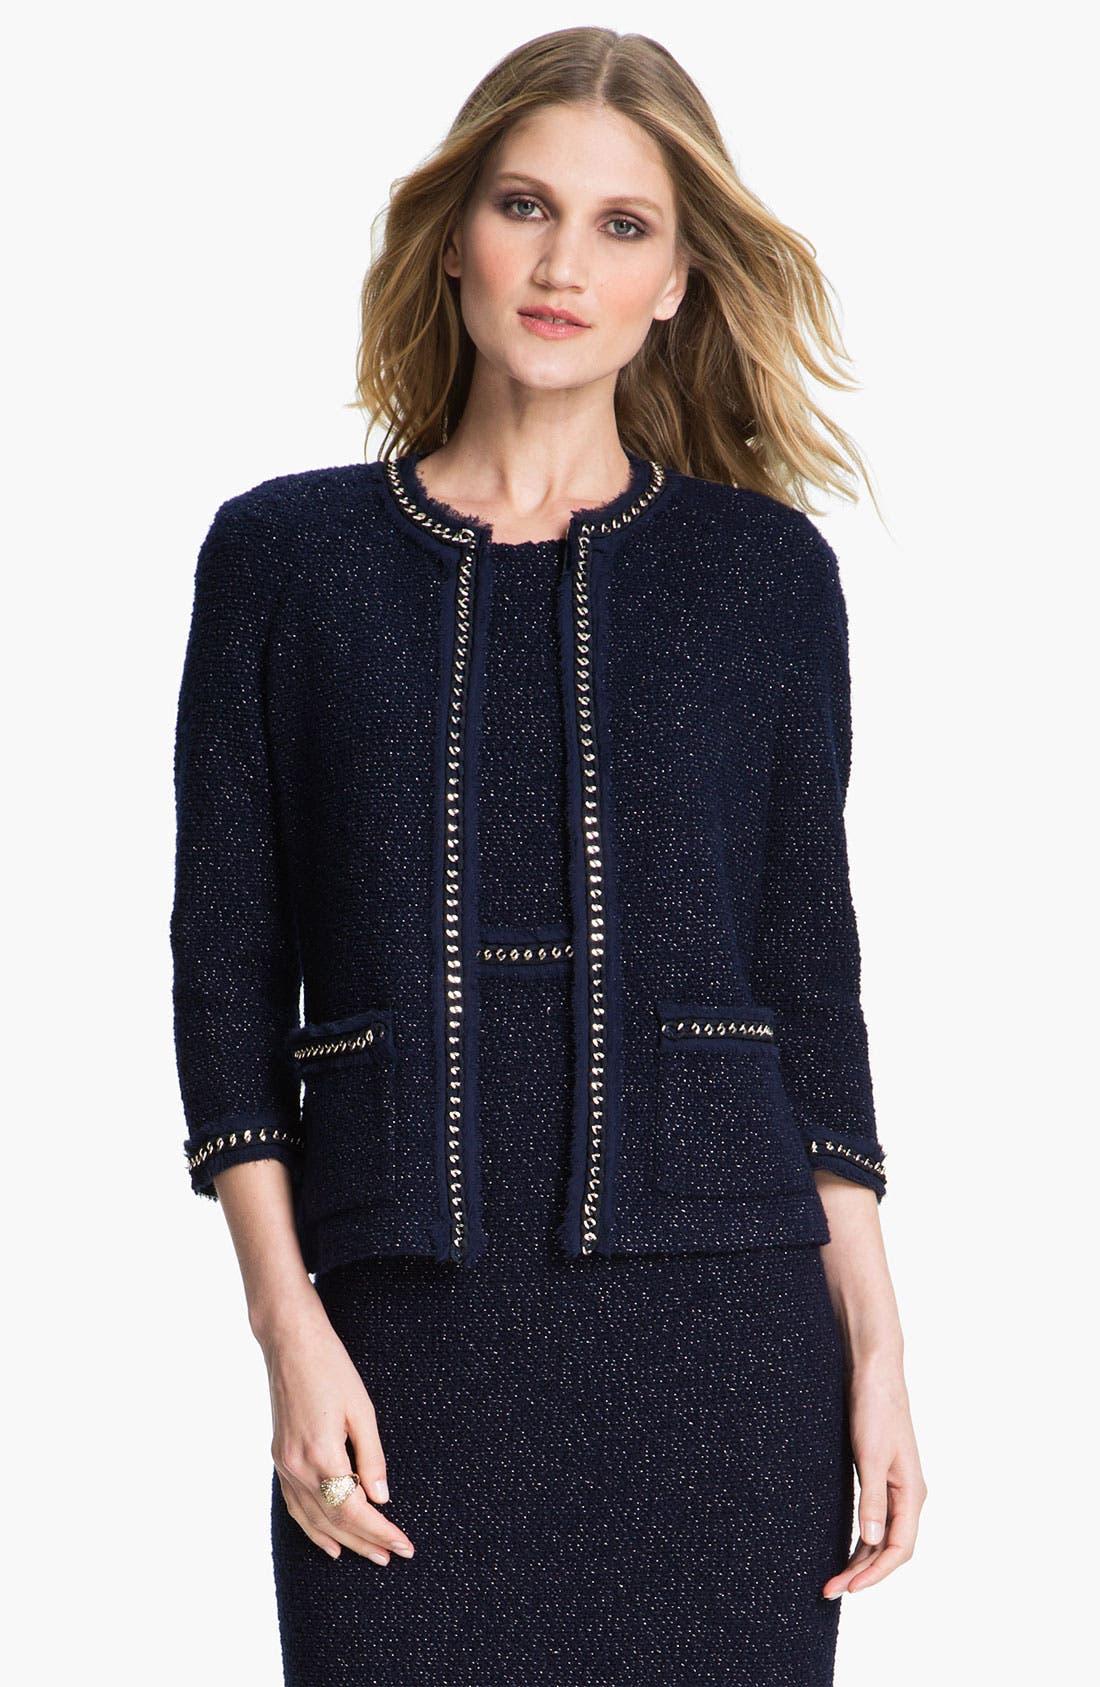 Alternate Image 1 Selected - St. John Collection Shimmer Bouclette Jacket